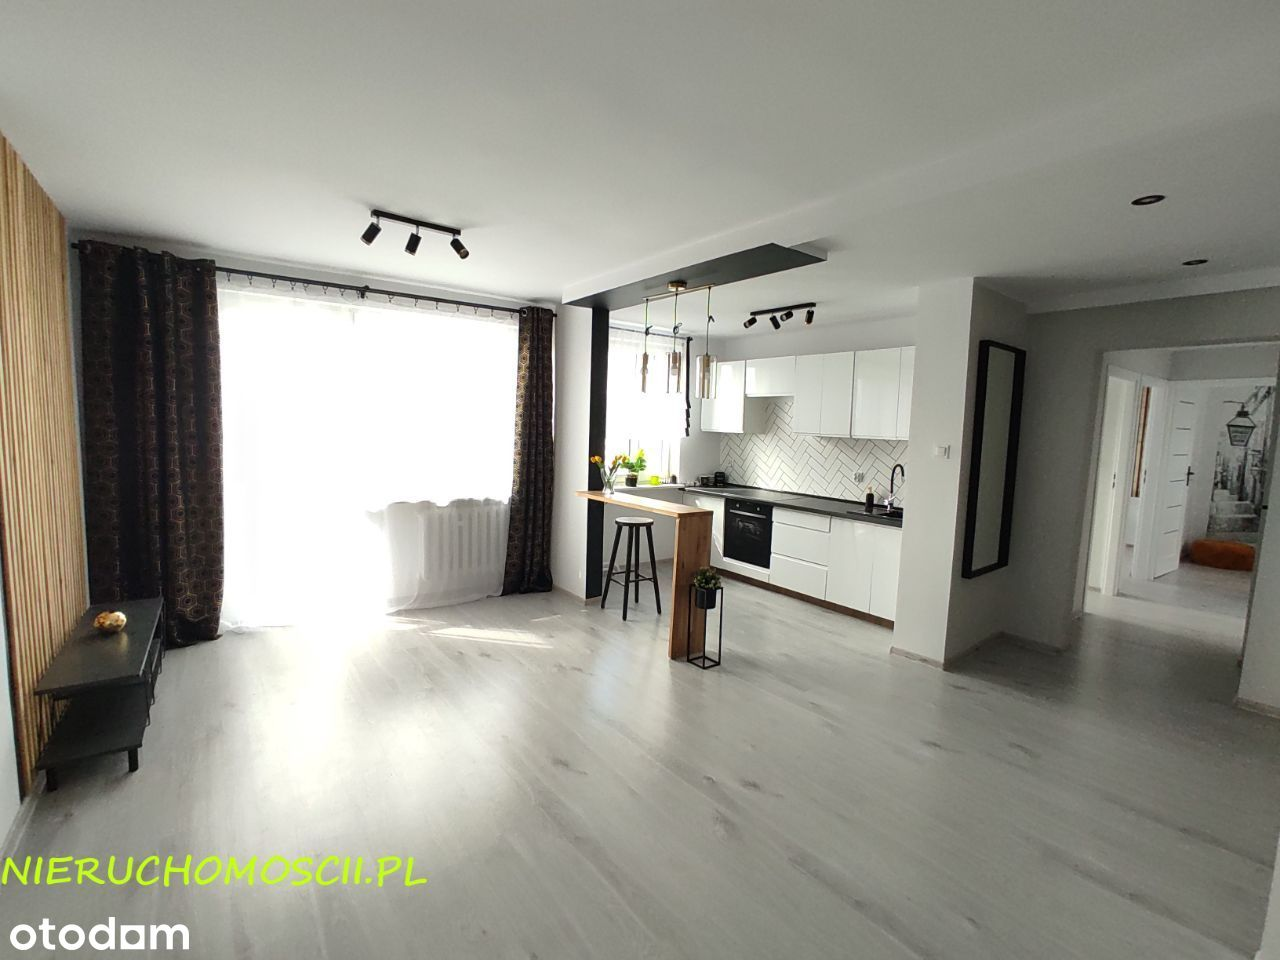 Mieszkanie Malborka centrum 4 pokoje bok 2 windy